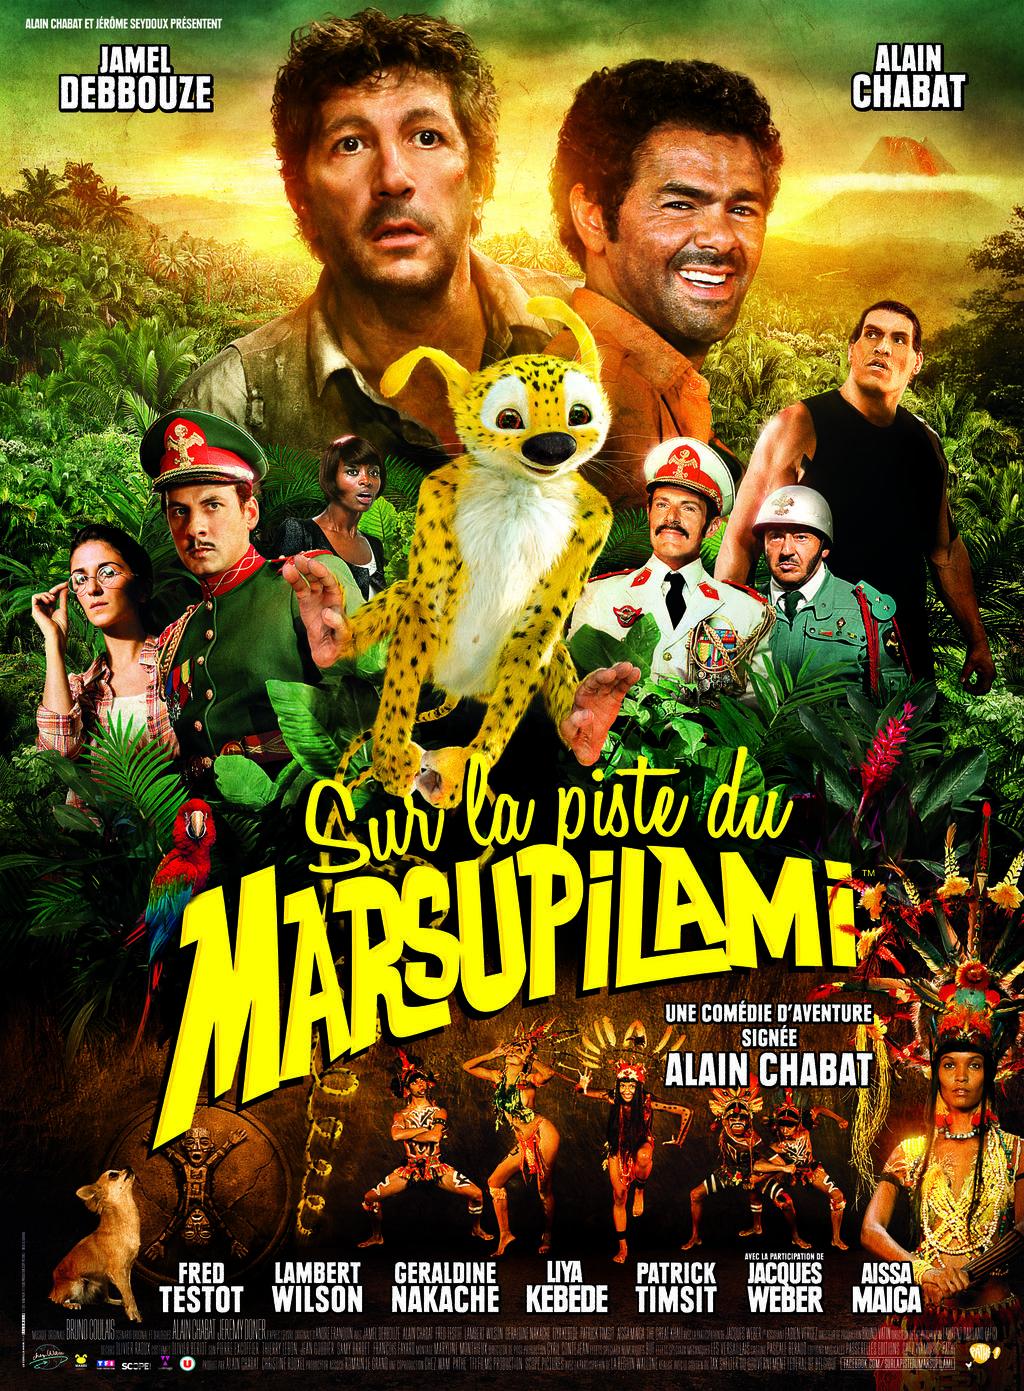 affiche du film Marsupilami